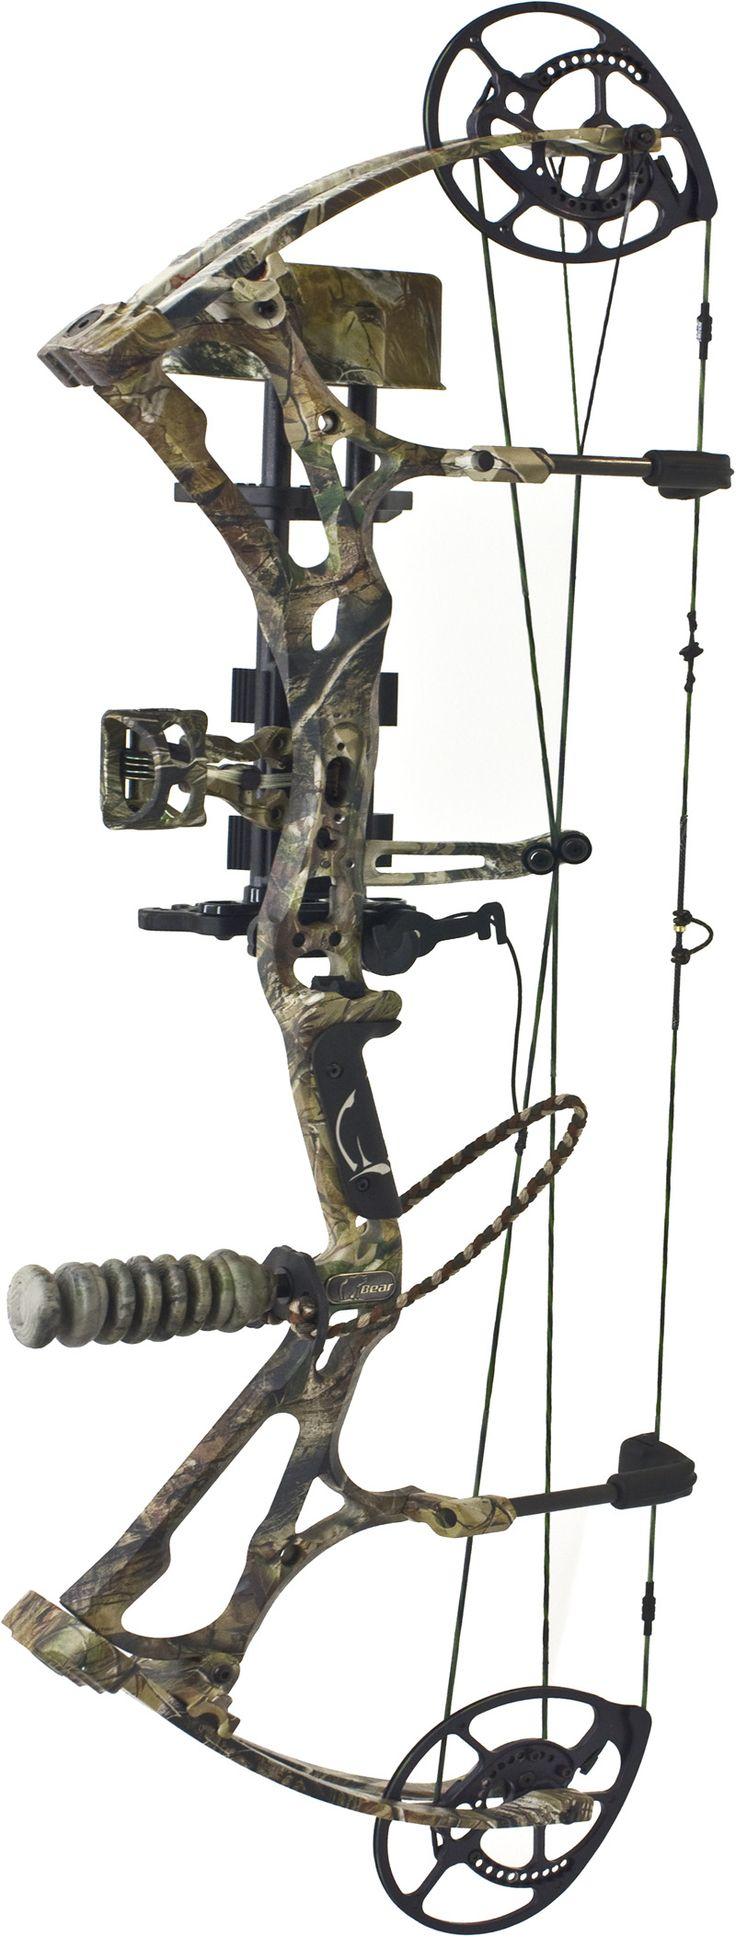 54 Best Images About Archery On Pinterest